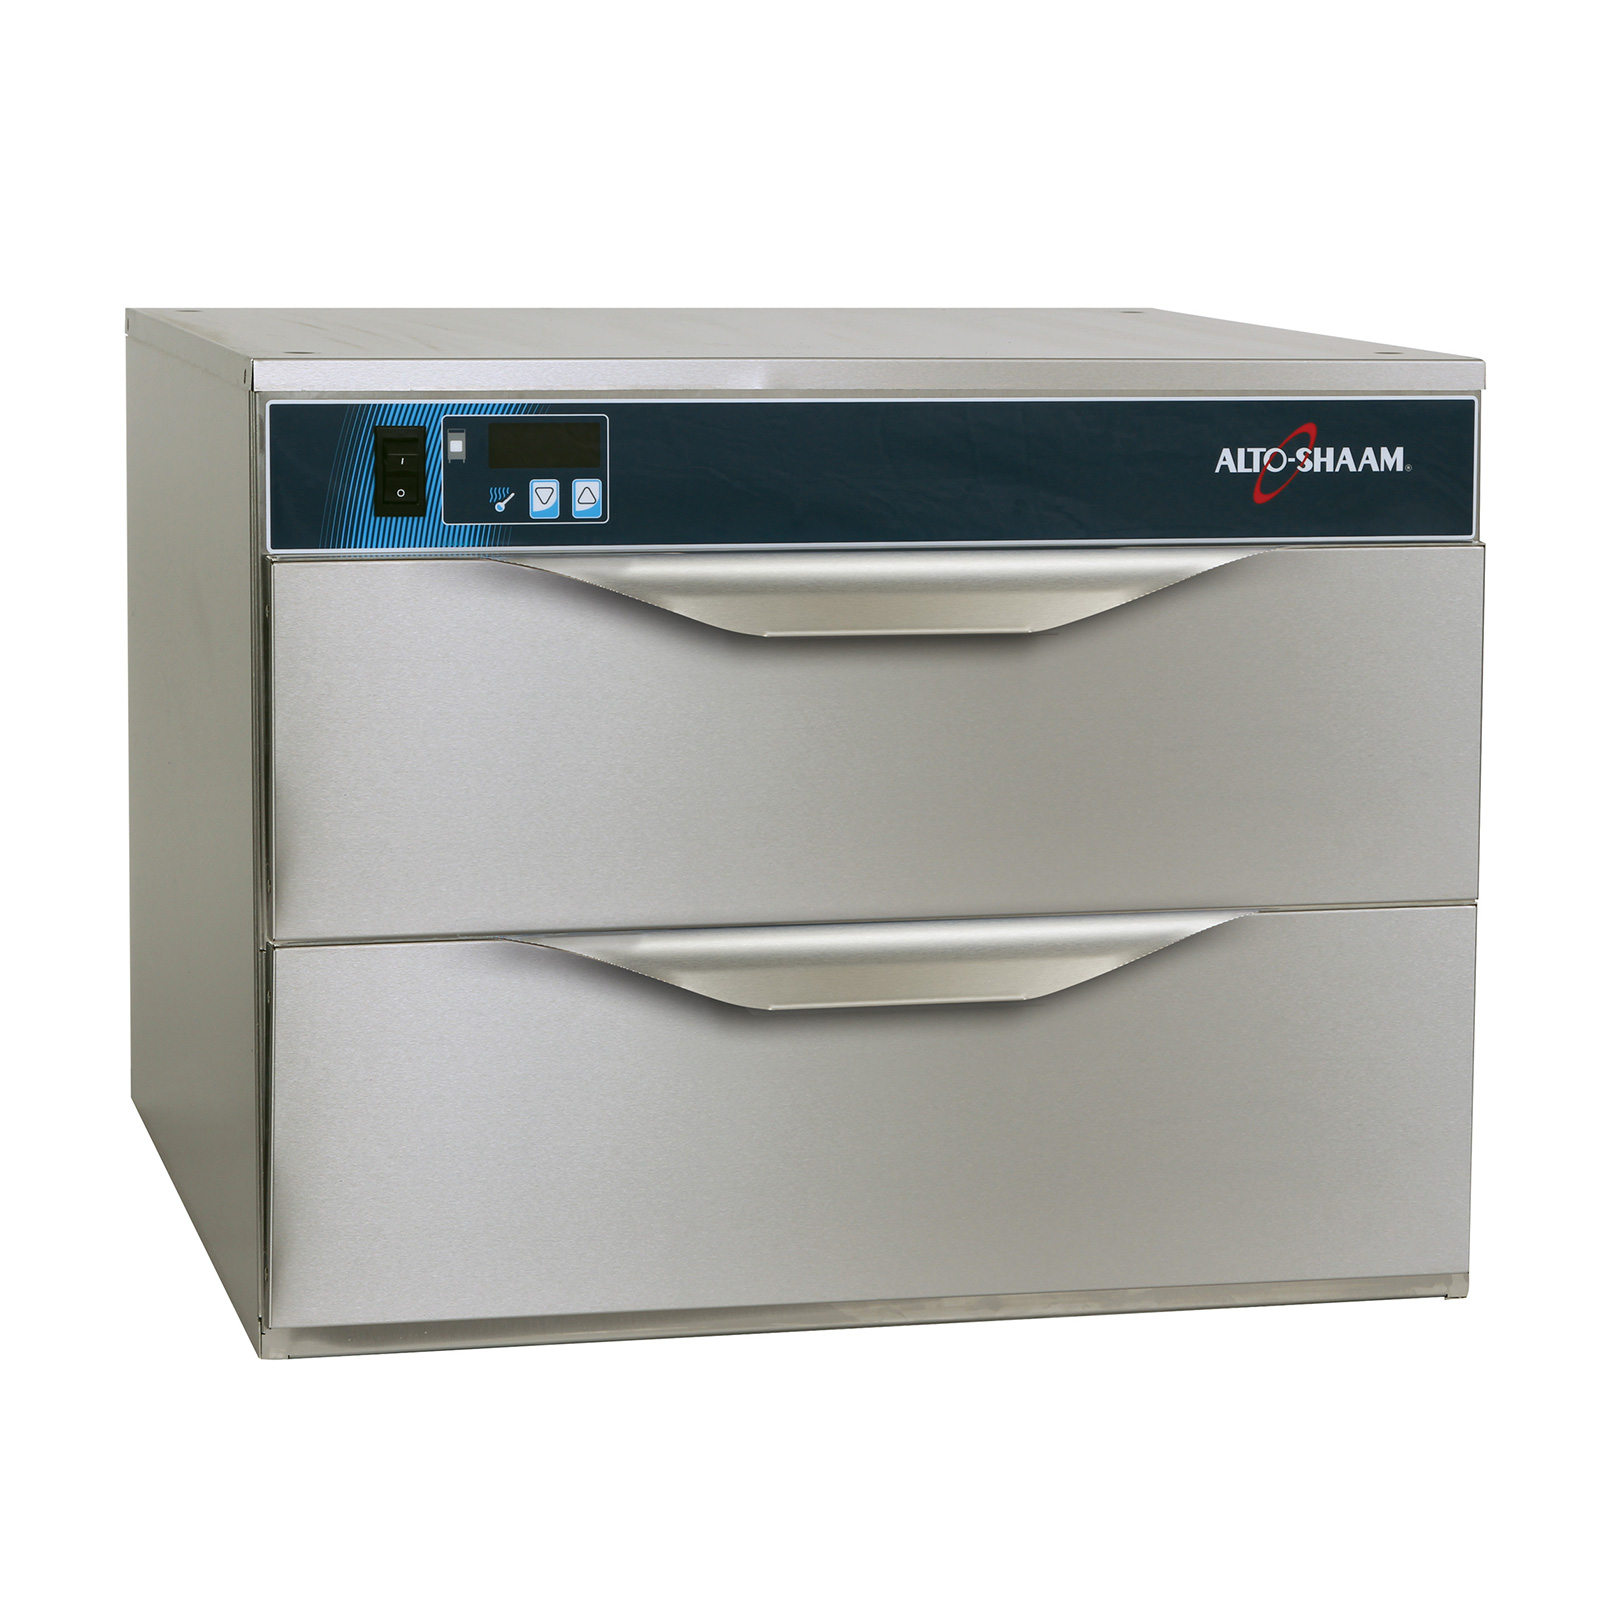 Alto-Shaam 500-2D-QS warming drawer, free standing